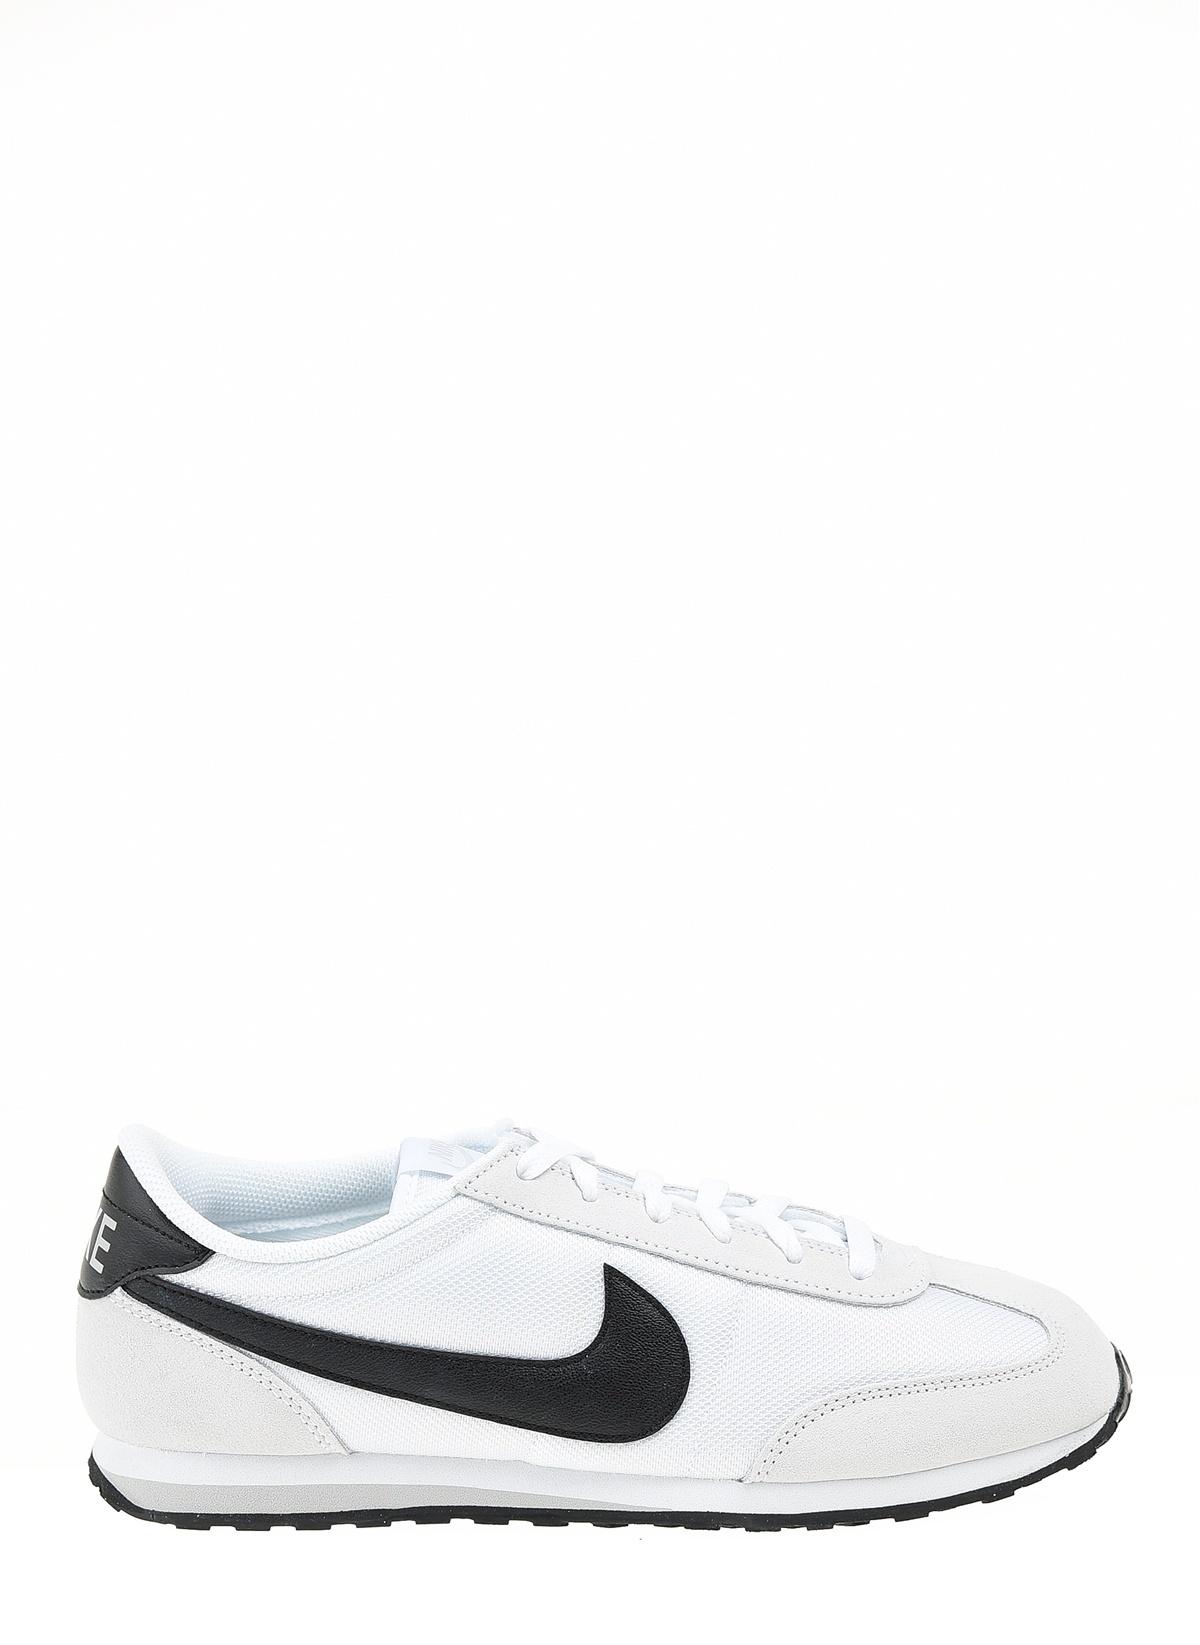 e3b553a72cca6 Nike Mach Runner Beyaz · Nike Mach Runner Beyaz ...